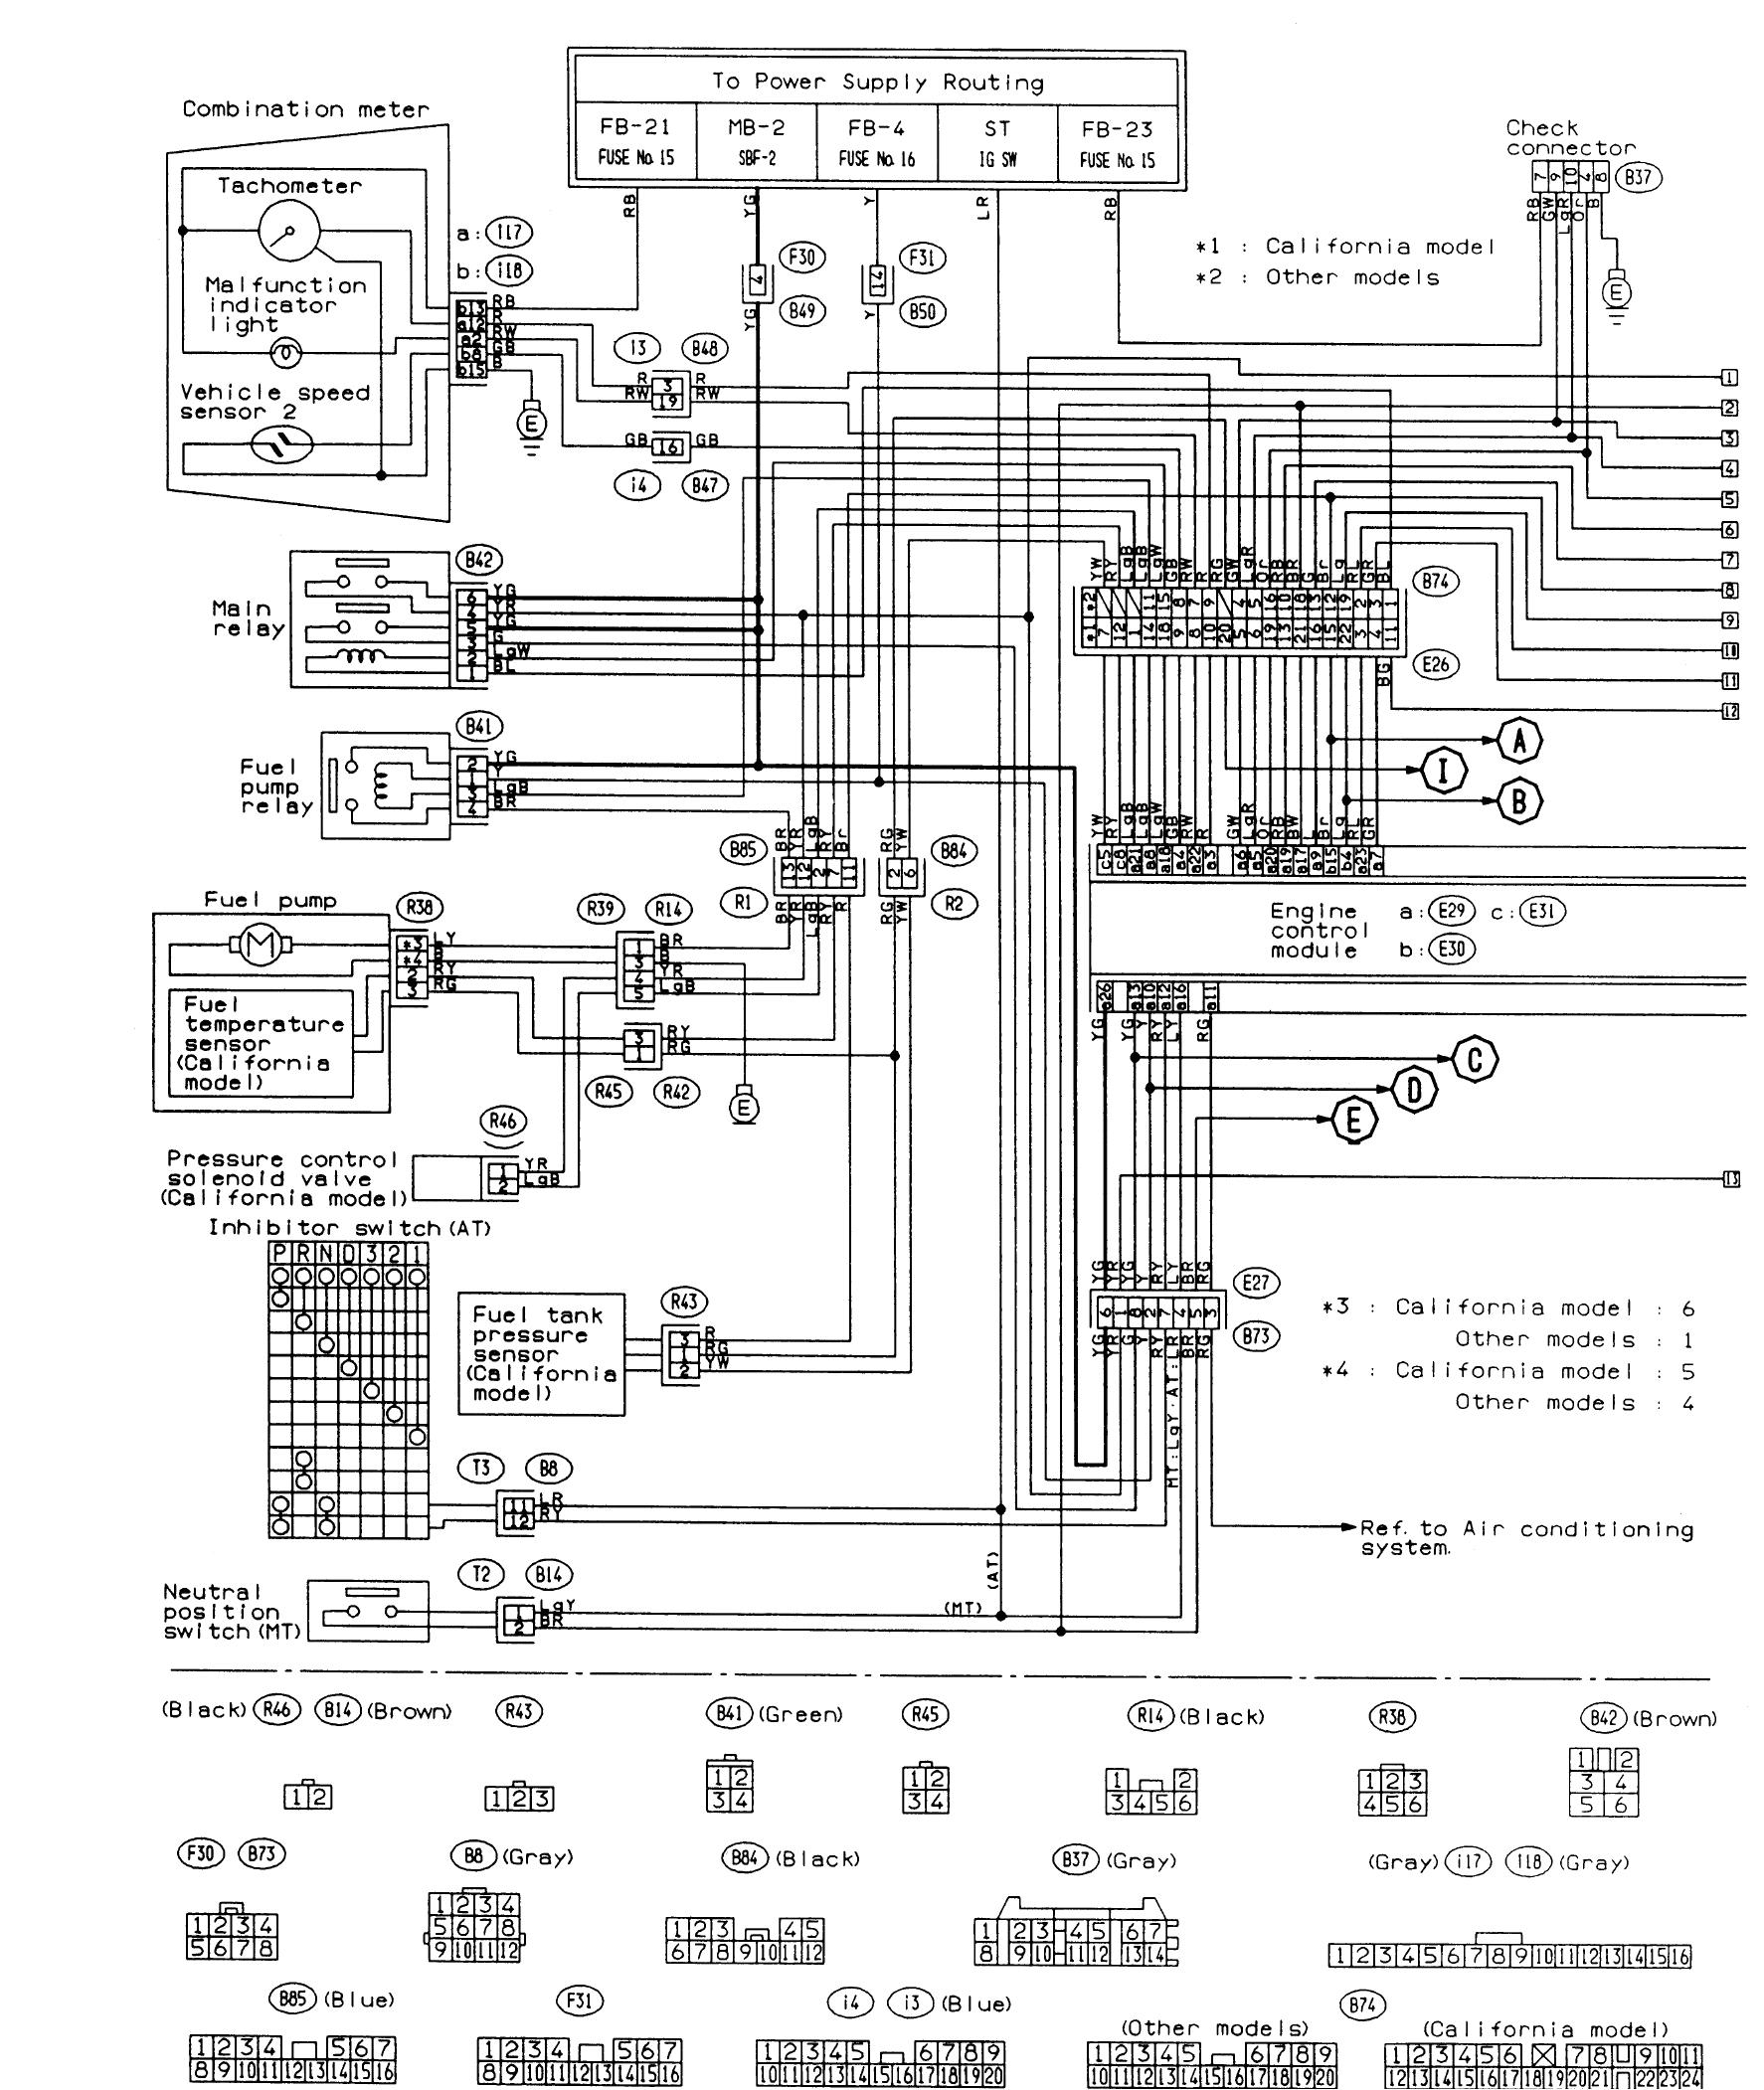 wrx 03 audio wiring diagram wiring diagrams 1995 subaru wiring diagram wiring diagram blog 1995 impreza